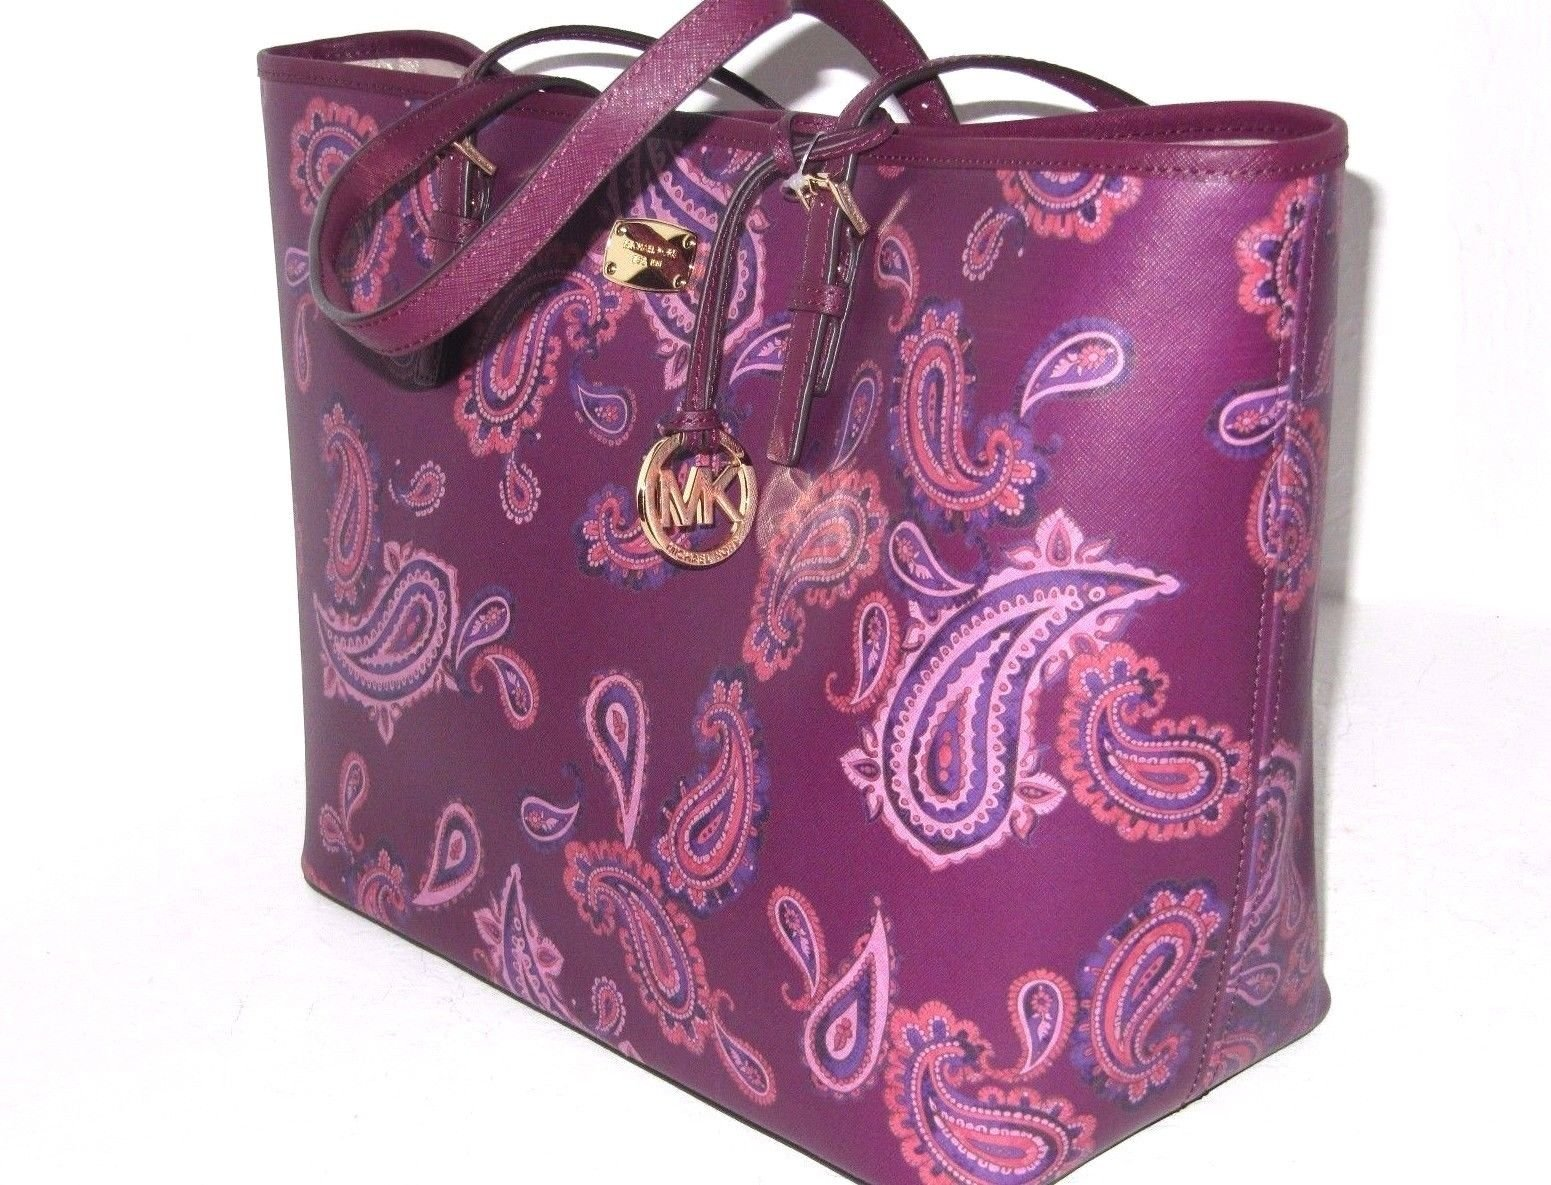 Michael Kors Women's Jet Set Travel Large Leather Carry All Tote Handbag (Plum) by Michael Kors